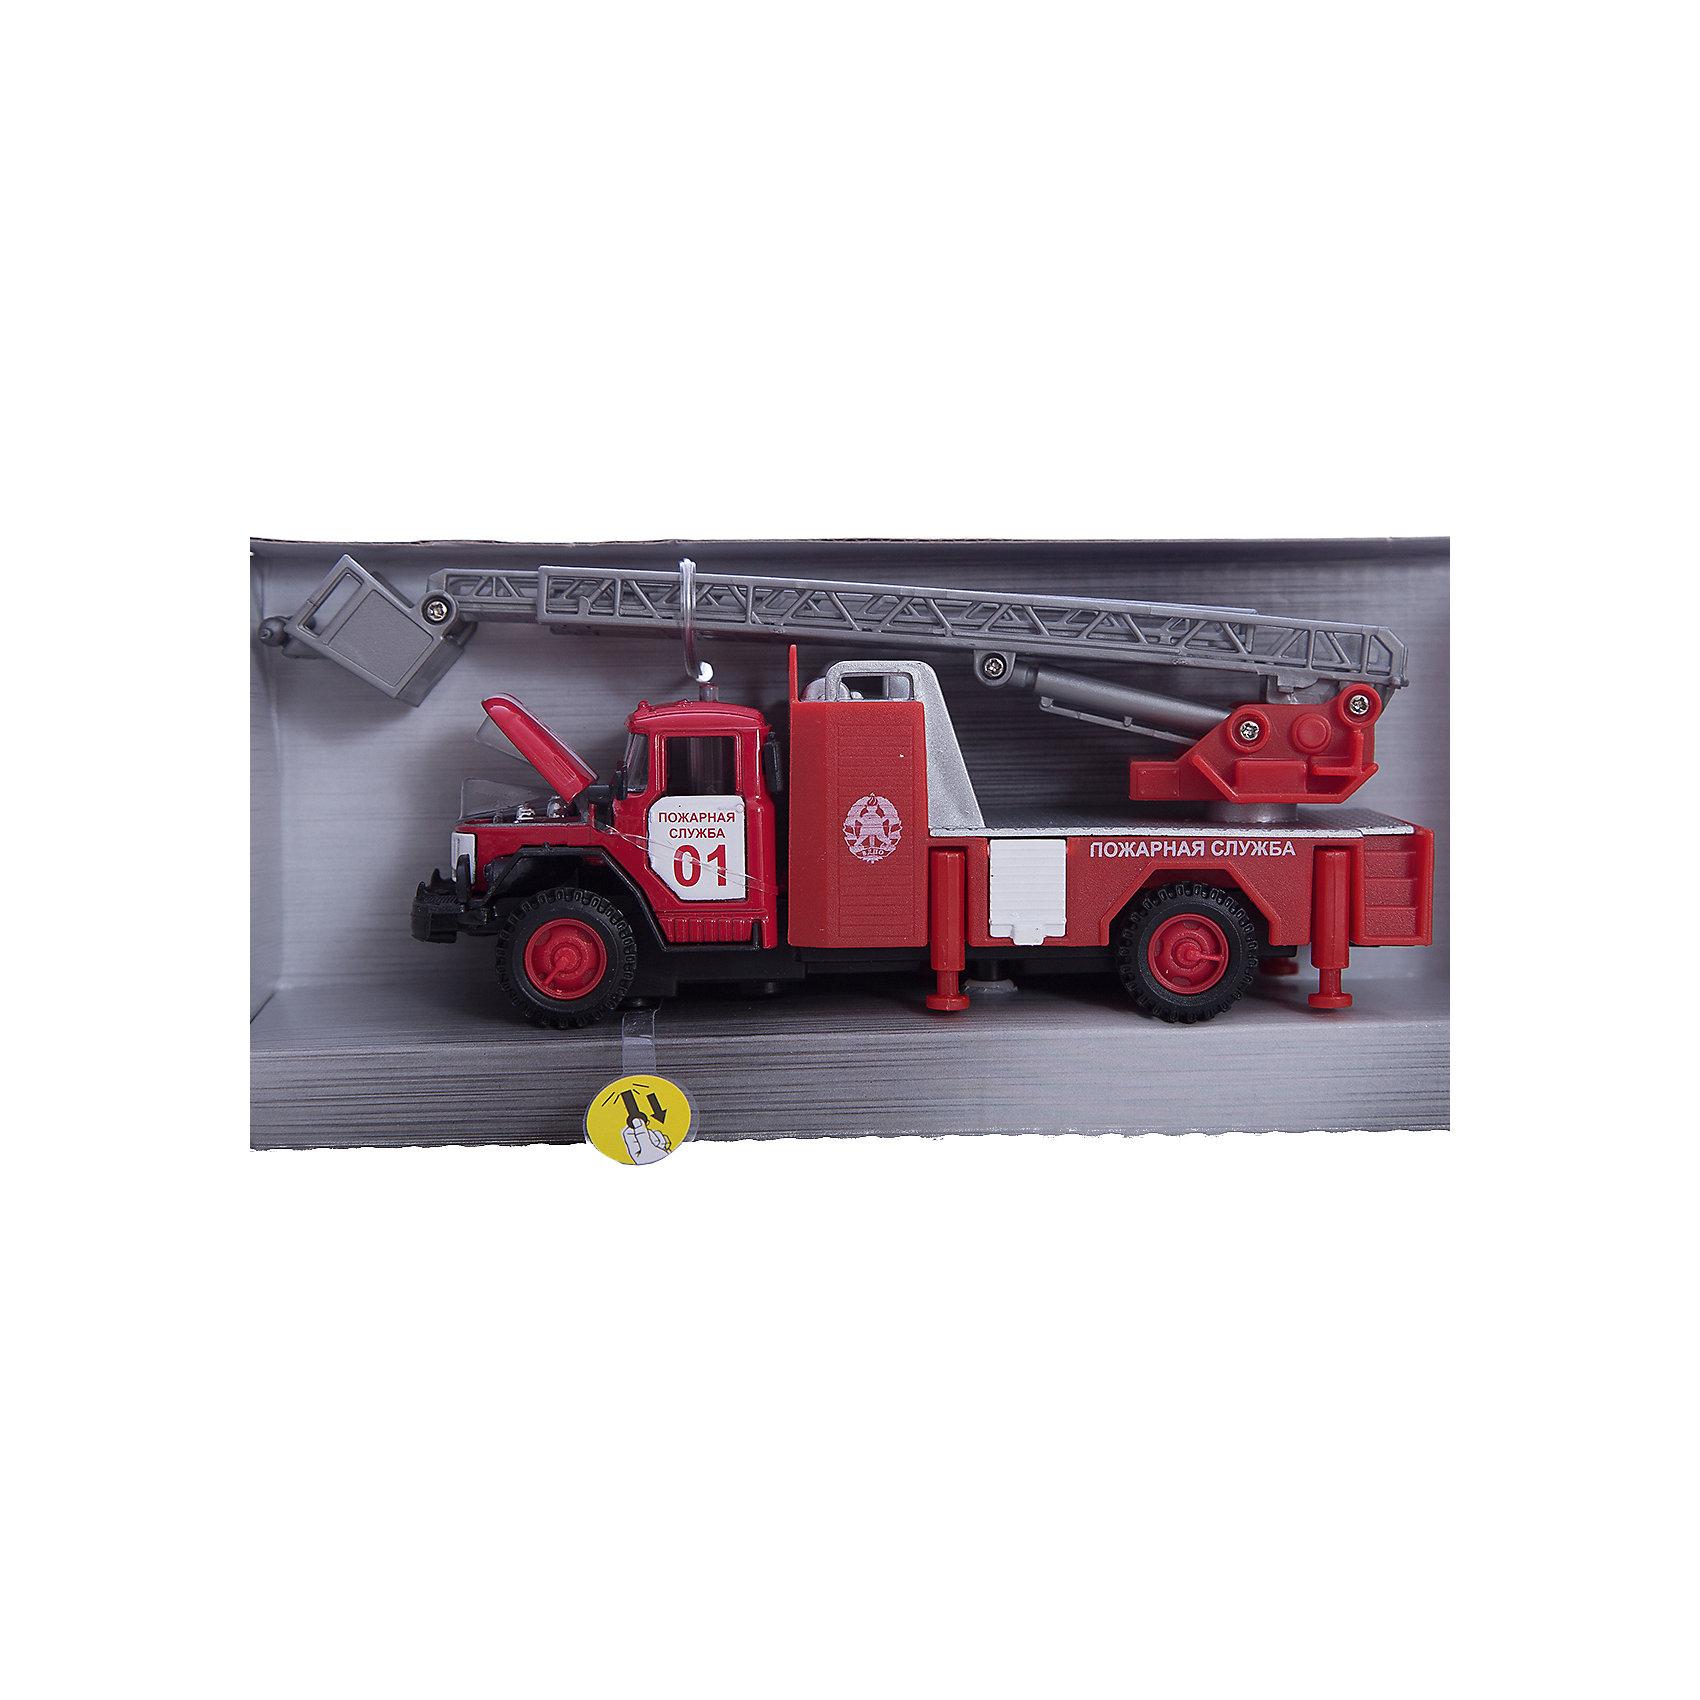 Машина ЗИЛ 131 Пожарная служба, свет+звук, ТЕХНОПАРКМашинки<br>Машина Технопарк металлическая  инерционная ЗИЛ 131 Пожарная служба, свет+звук.<br><br>Ширина мм: 60<br>Глубина мм: 150<br>Высота мм: 220<br>Вес г: 220<br>Возраст от месяцев: 36<br>Возраст до месяцев: 84<br>Пол: Мужской<br>Возраст: Детский<br>SKU: 5420369